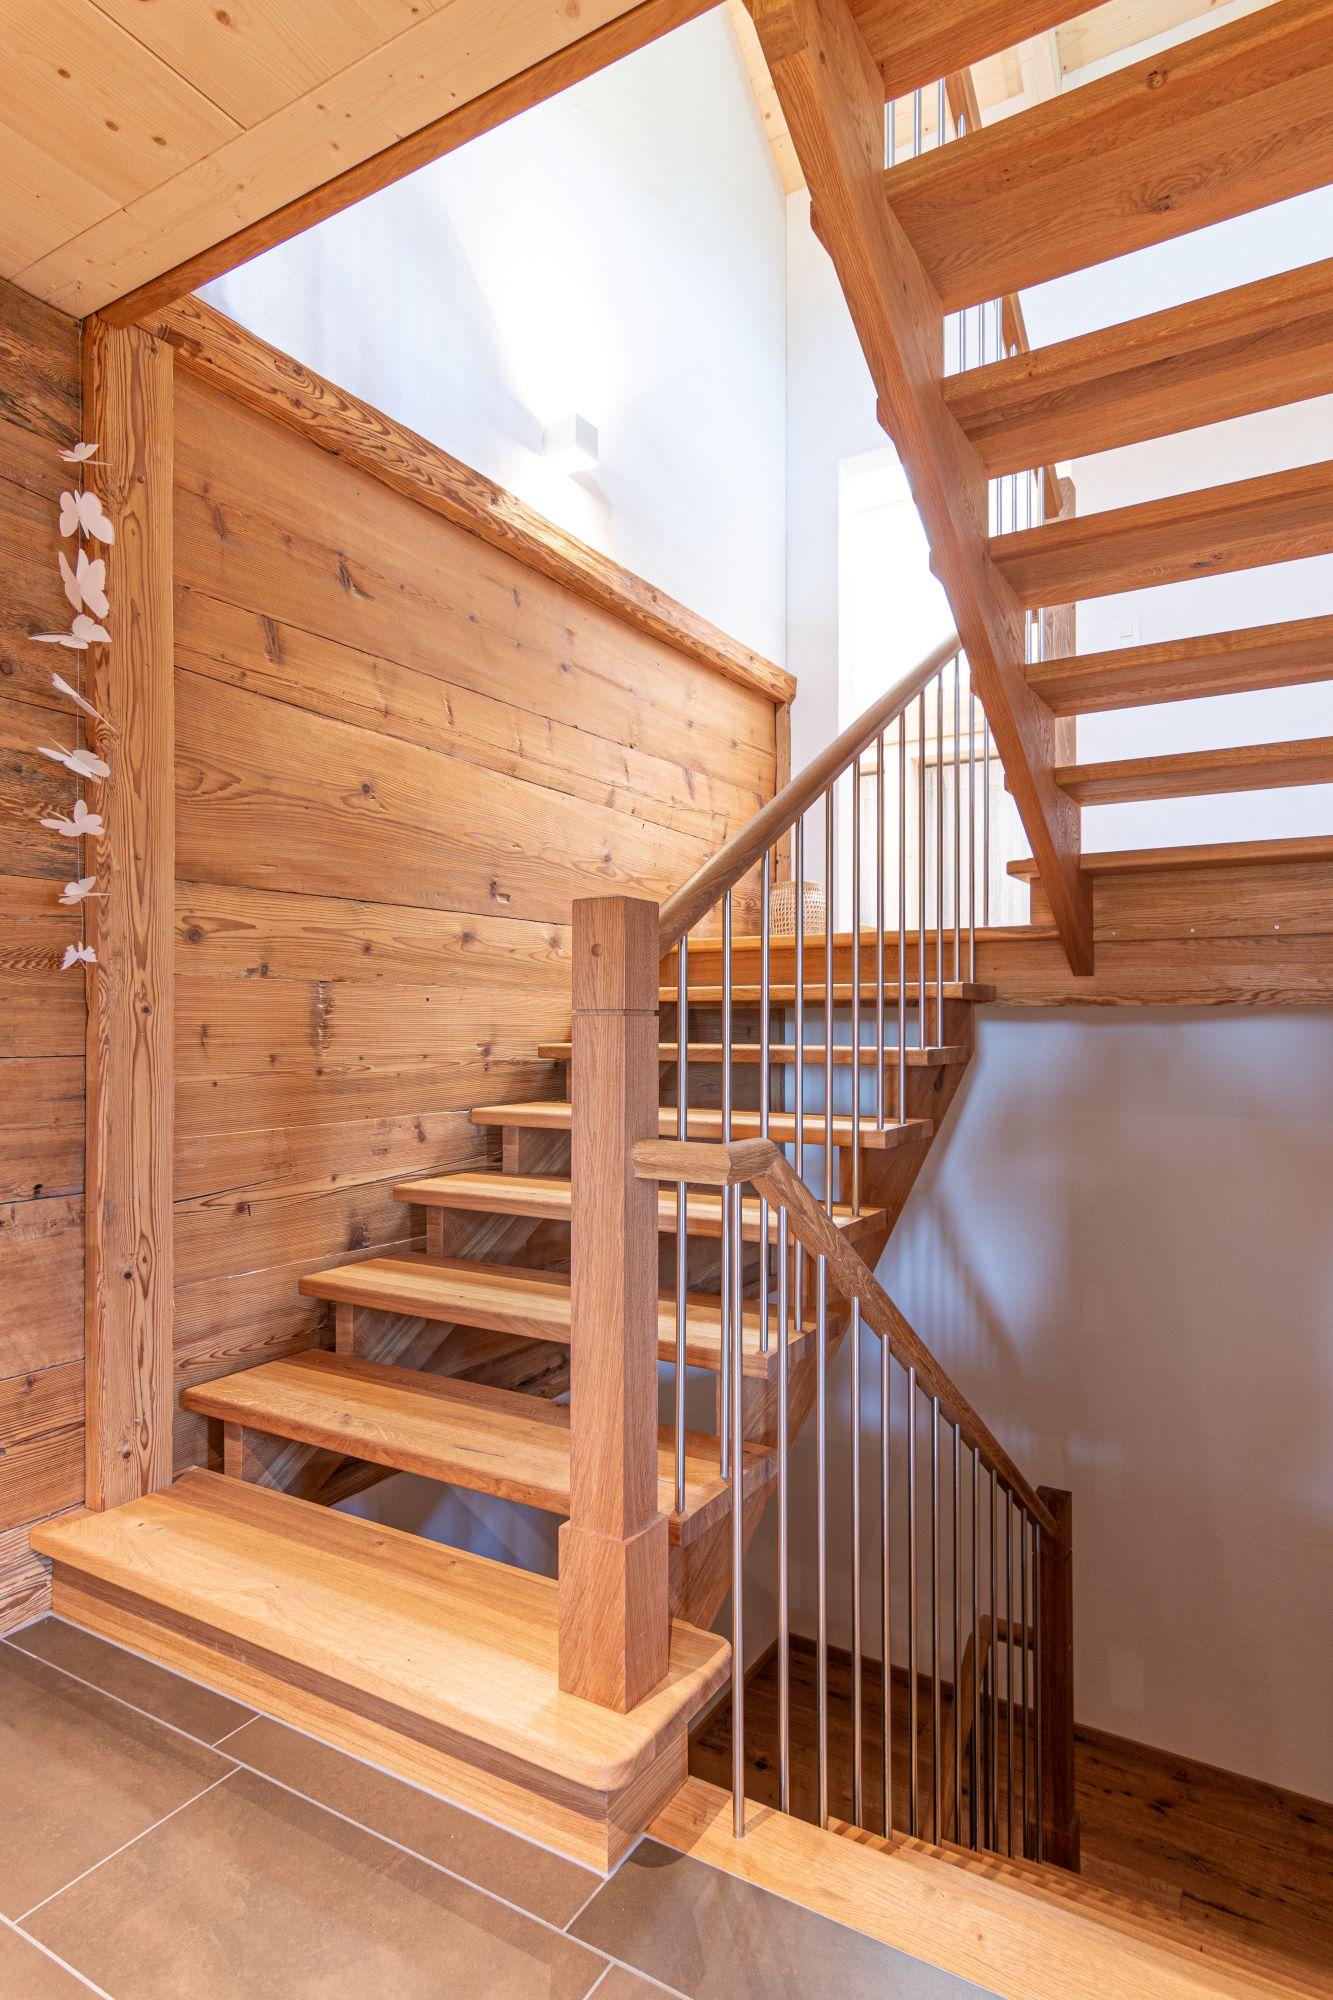 Stair Image 1295